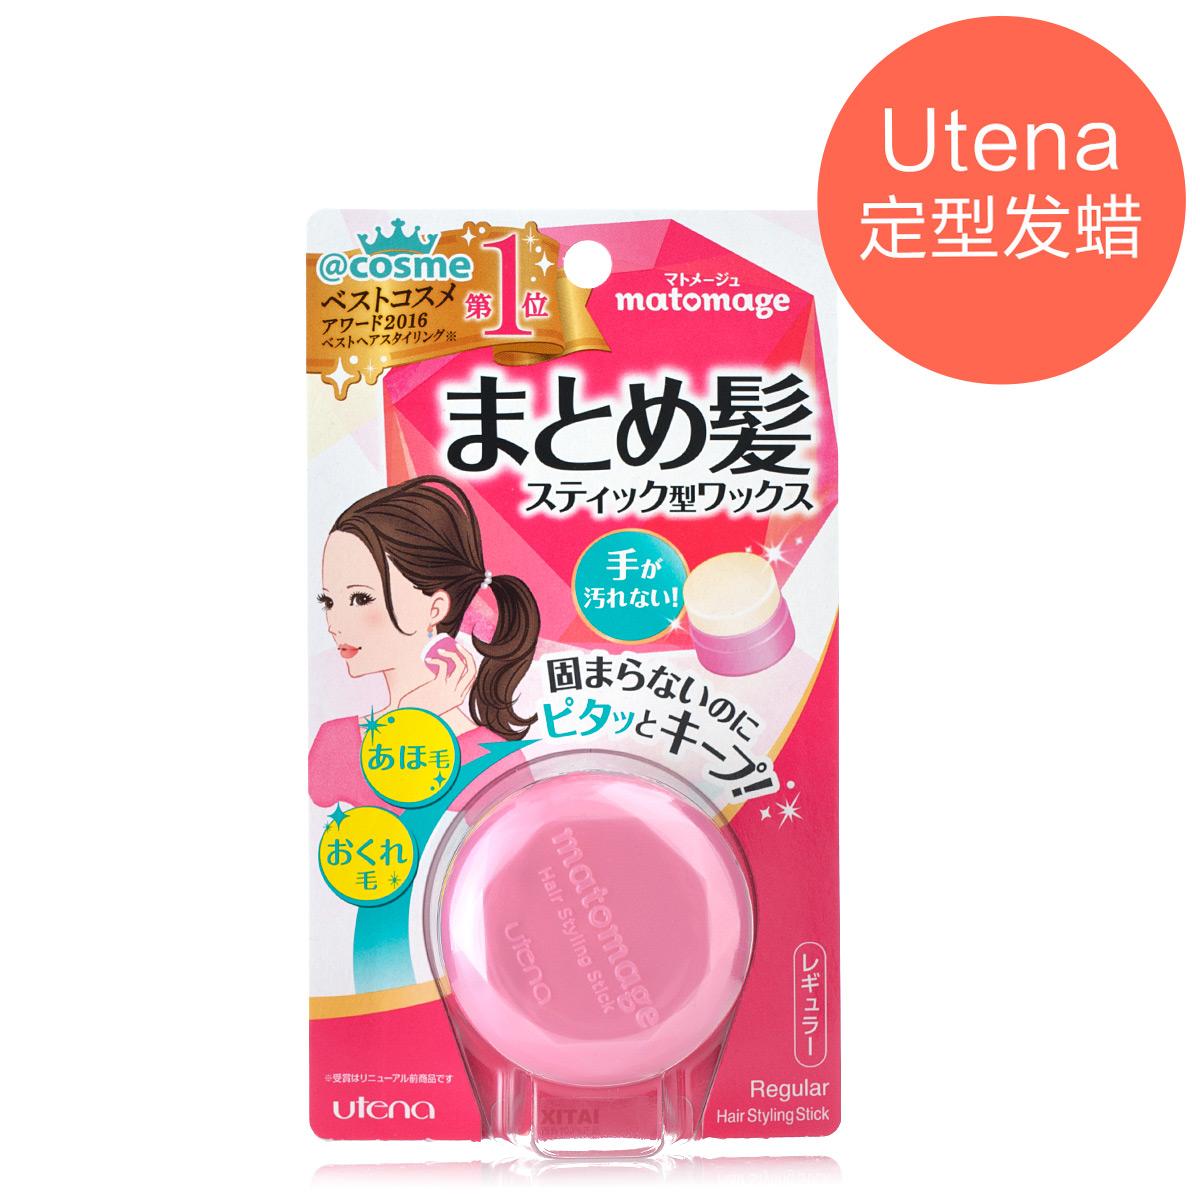 Japan You Tianlan Utena Hair Styling Cream Hair Wax Broken Hair